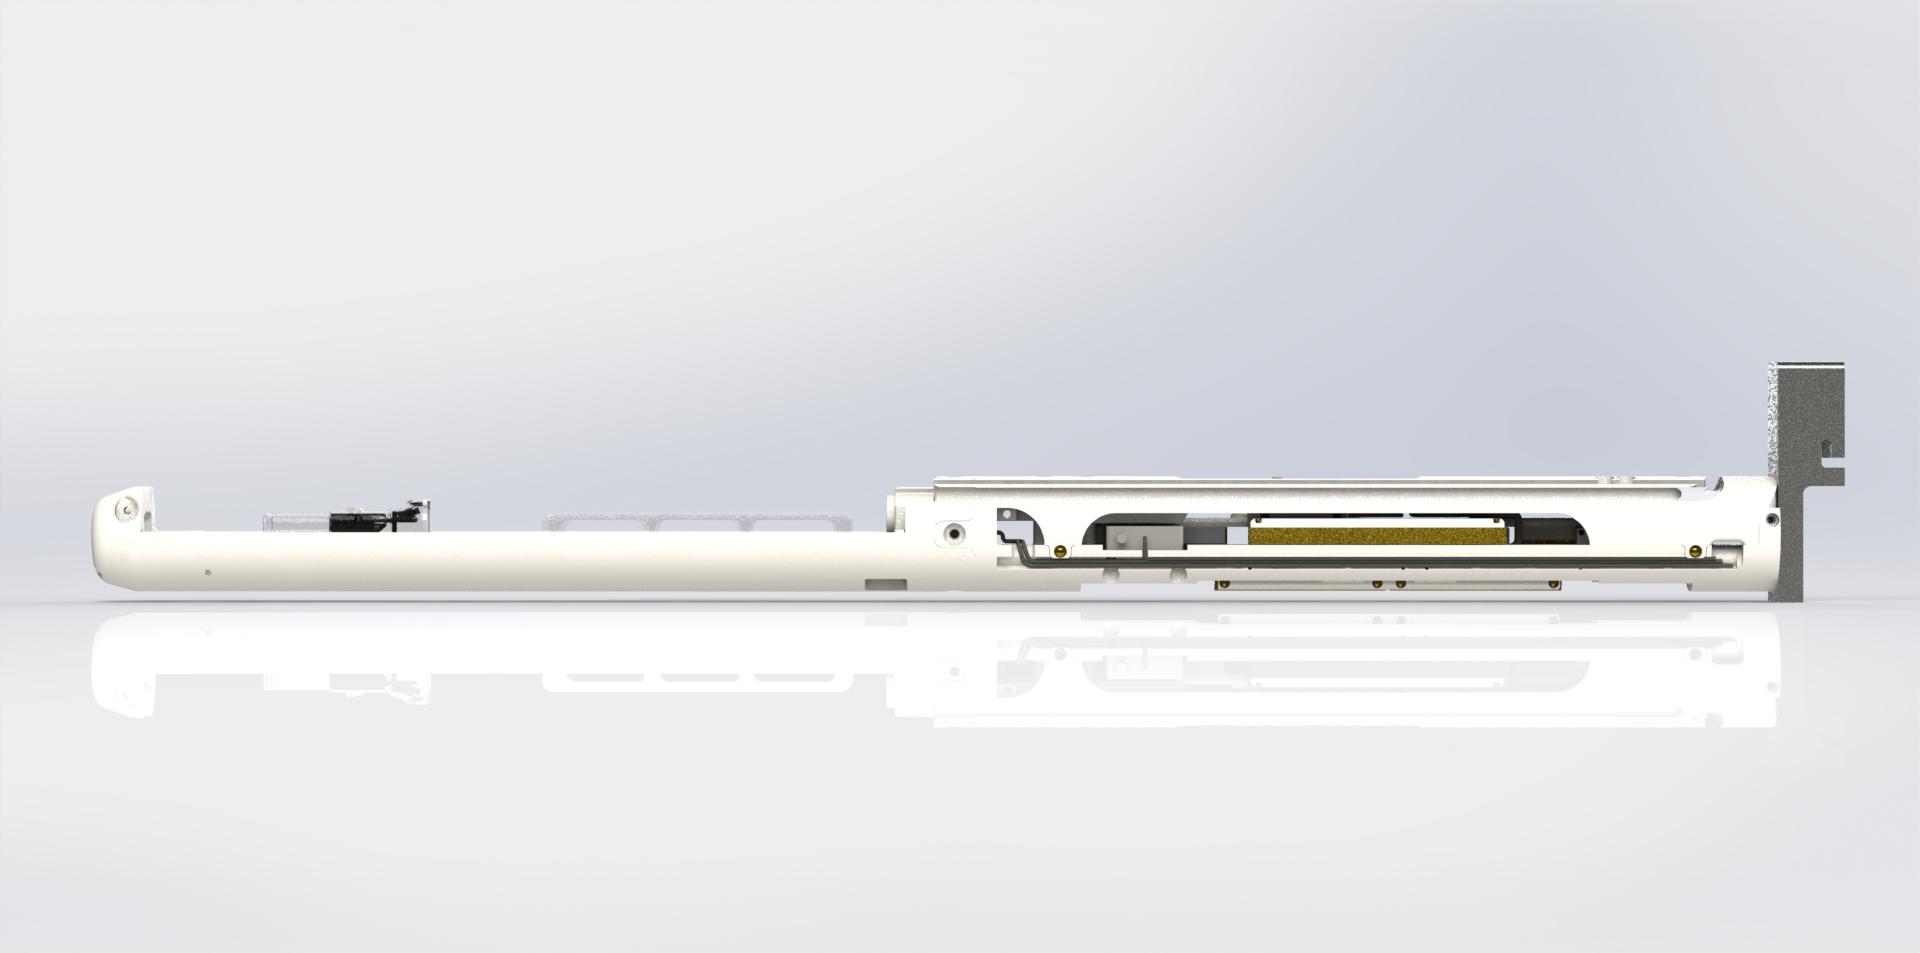 RK300-3.JPG